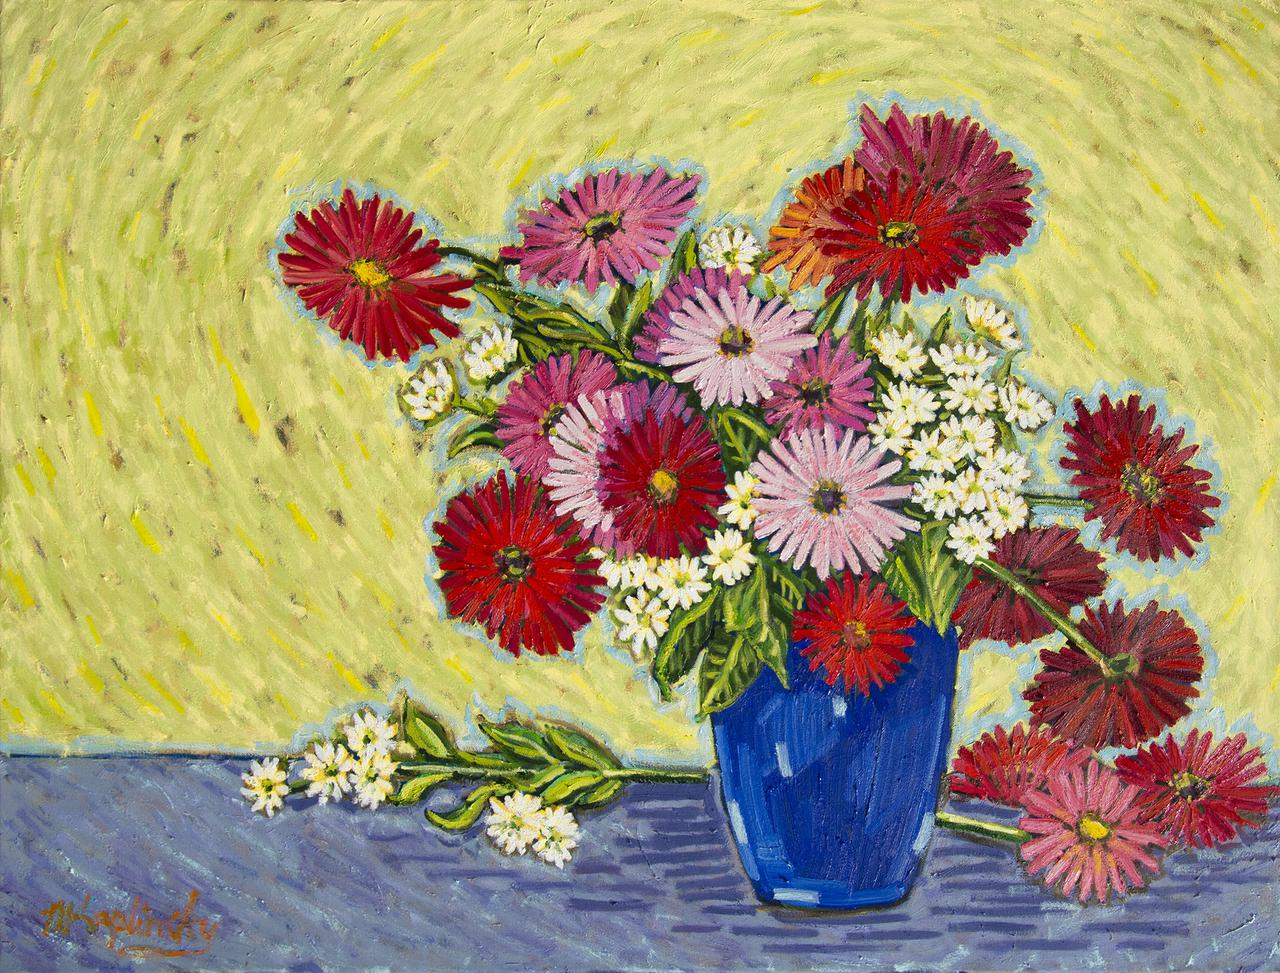 Vase Full of Gerbers oil on canvas by Matt Kaplinsky 30x40